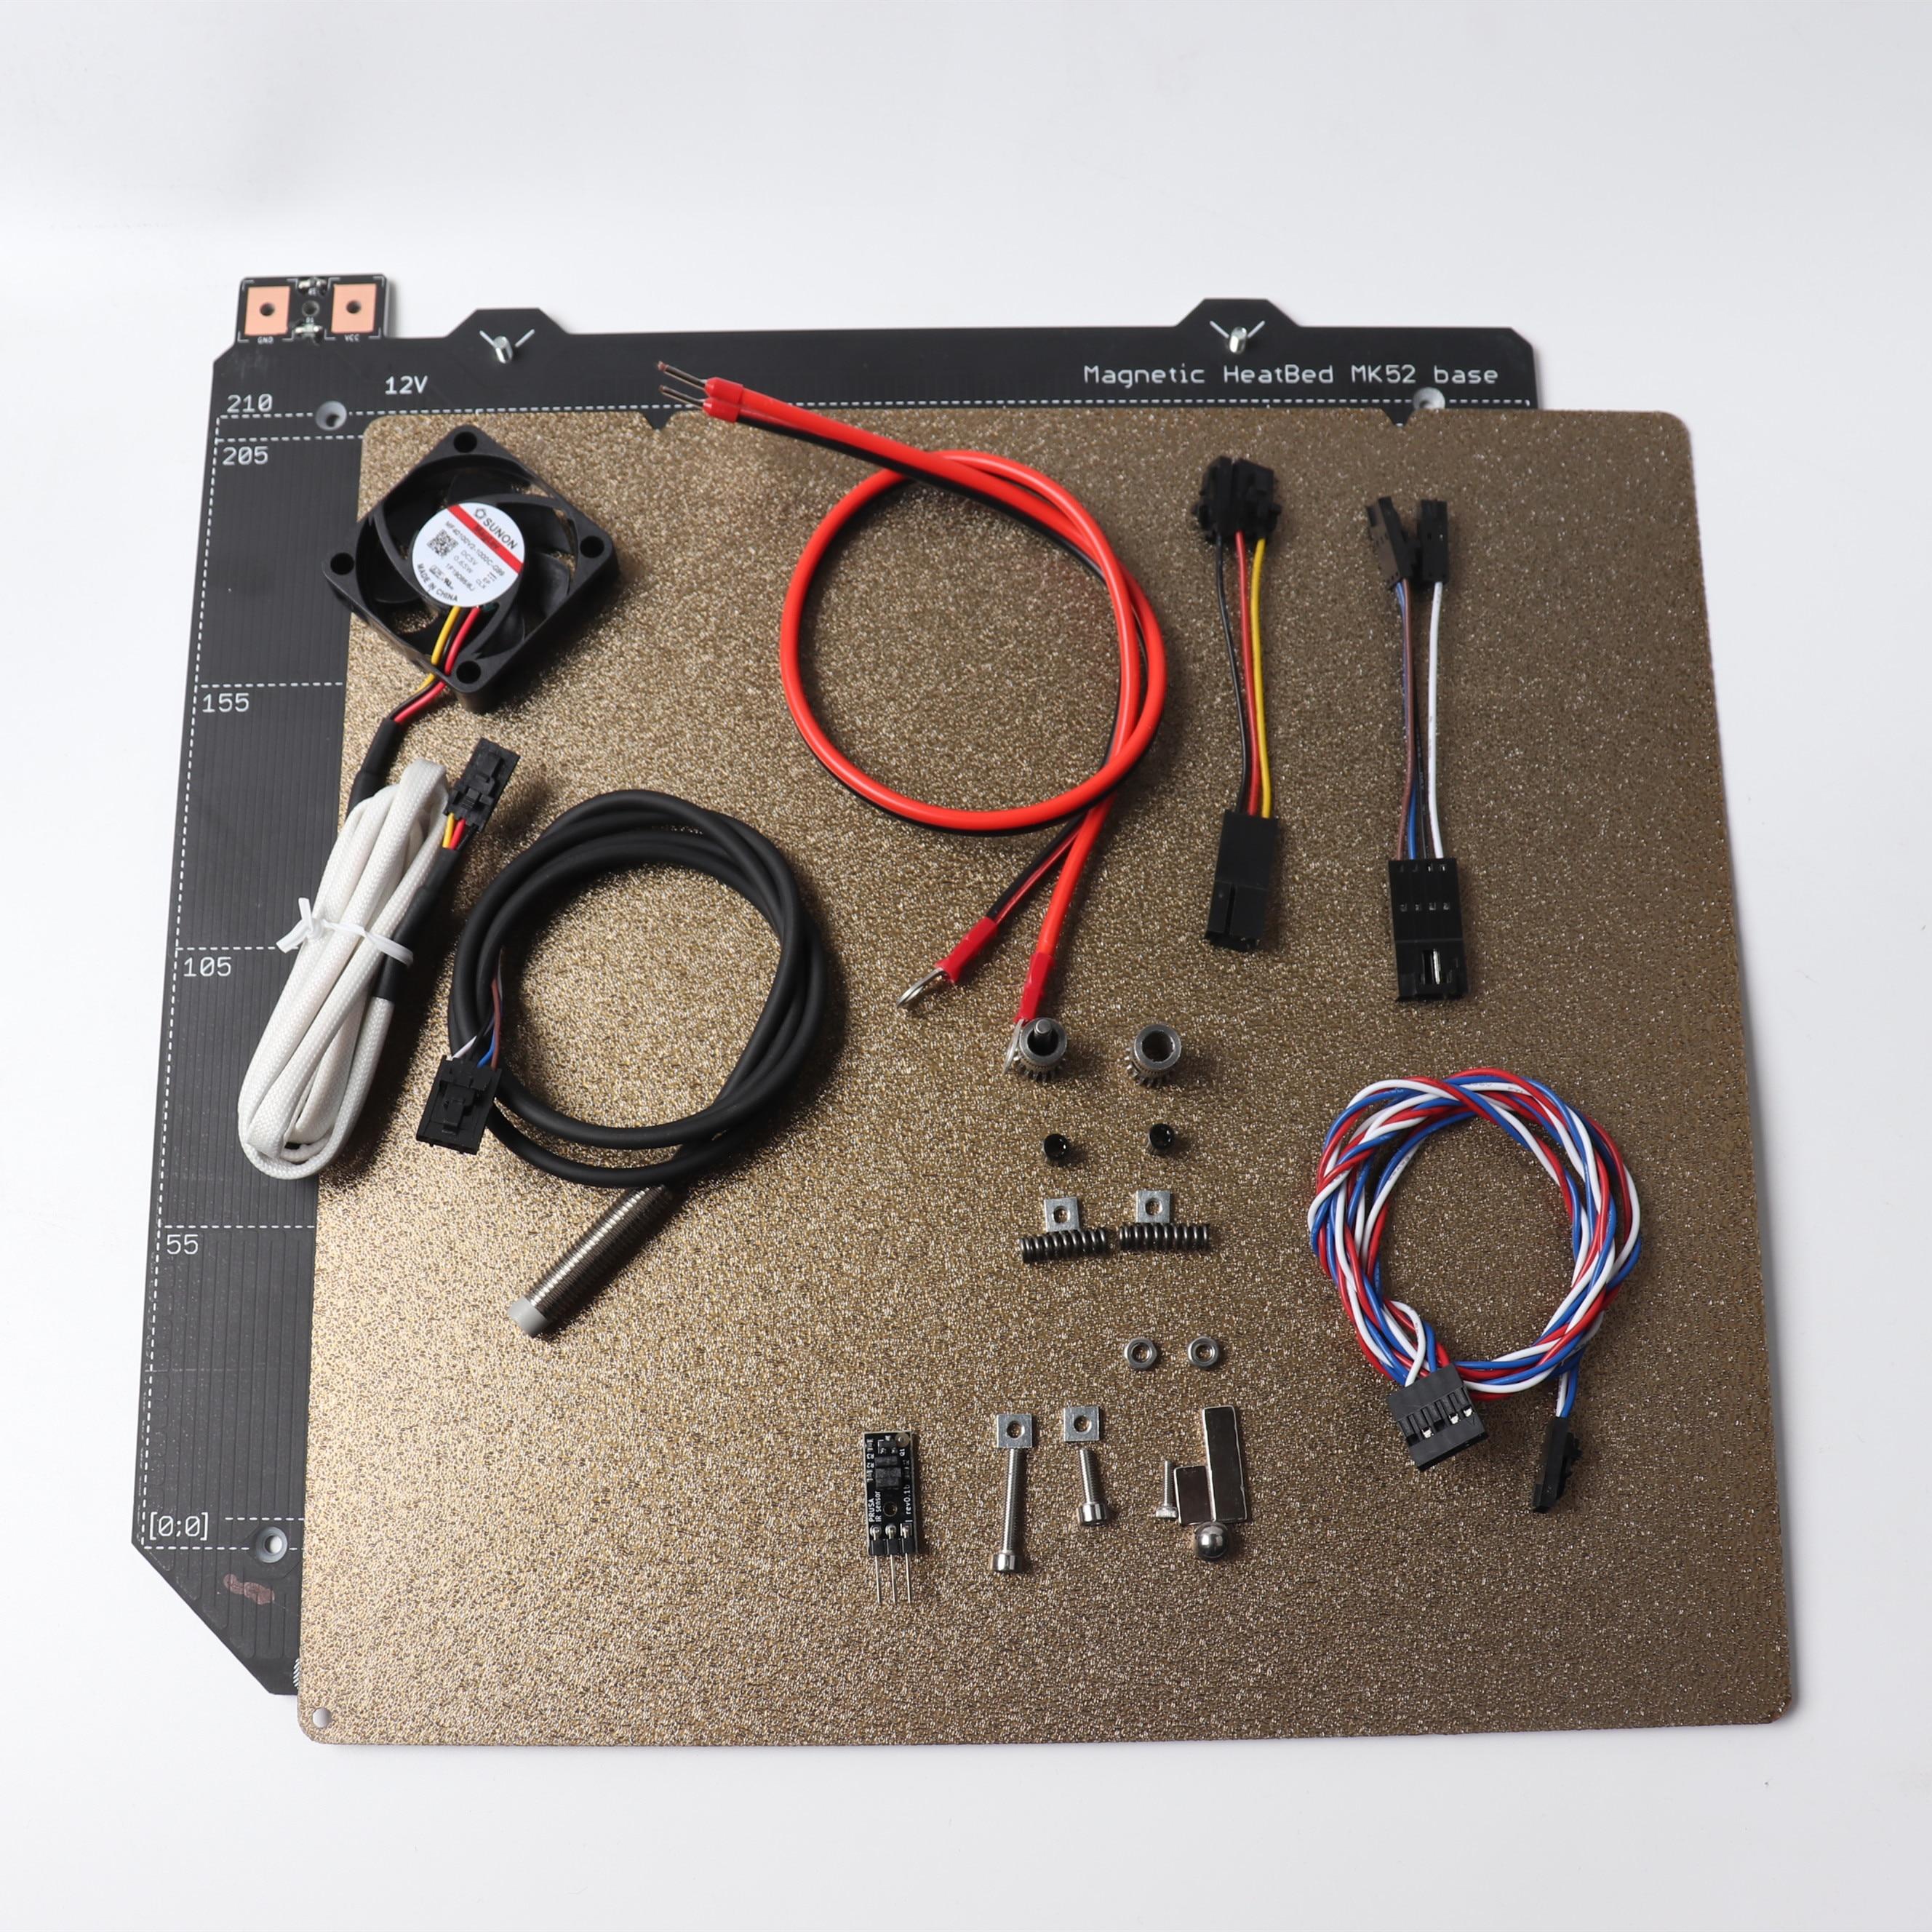 Cloned Prusa i3 MK2/S to MK2.5S upgrade kit with MK52 12V heatbed, Sunon v2 5V  fan, Powdered textured PEI sheet, PINDA V2 probeCloned Prusa i3 MK2/S to MK2.5S upgrade kit with MK52 12V heatbed, Sunon v2 5V  fan, Powdered textured PEI sheet, PINDA V2 probe